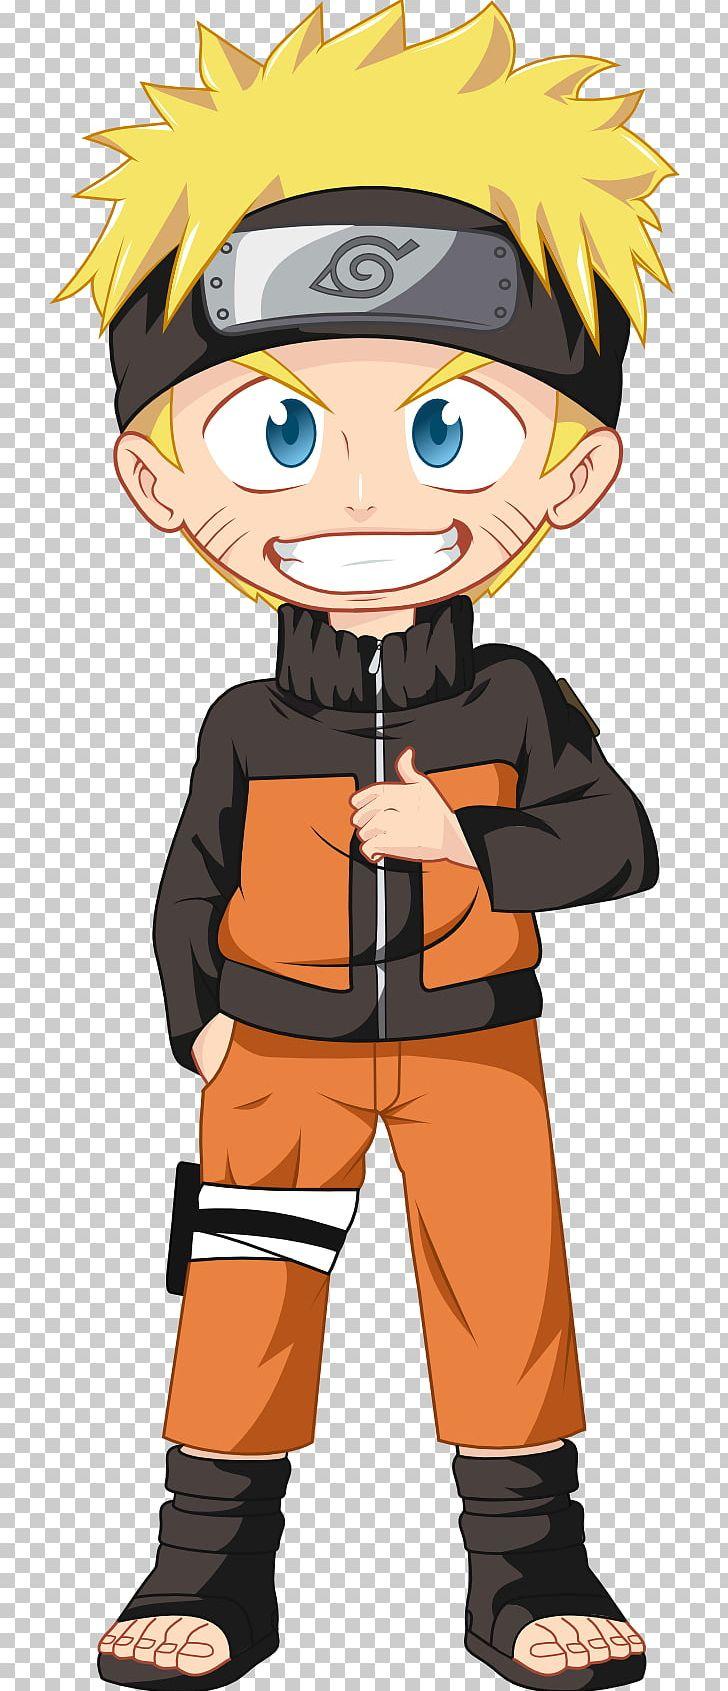 c9a7df796 Naruto Uzumaki Art Anime Chibi PNG, Clipart, Anime, Art, Cartoon,  Character, Chibi Free PNG Download